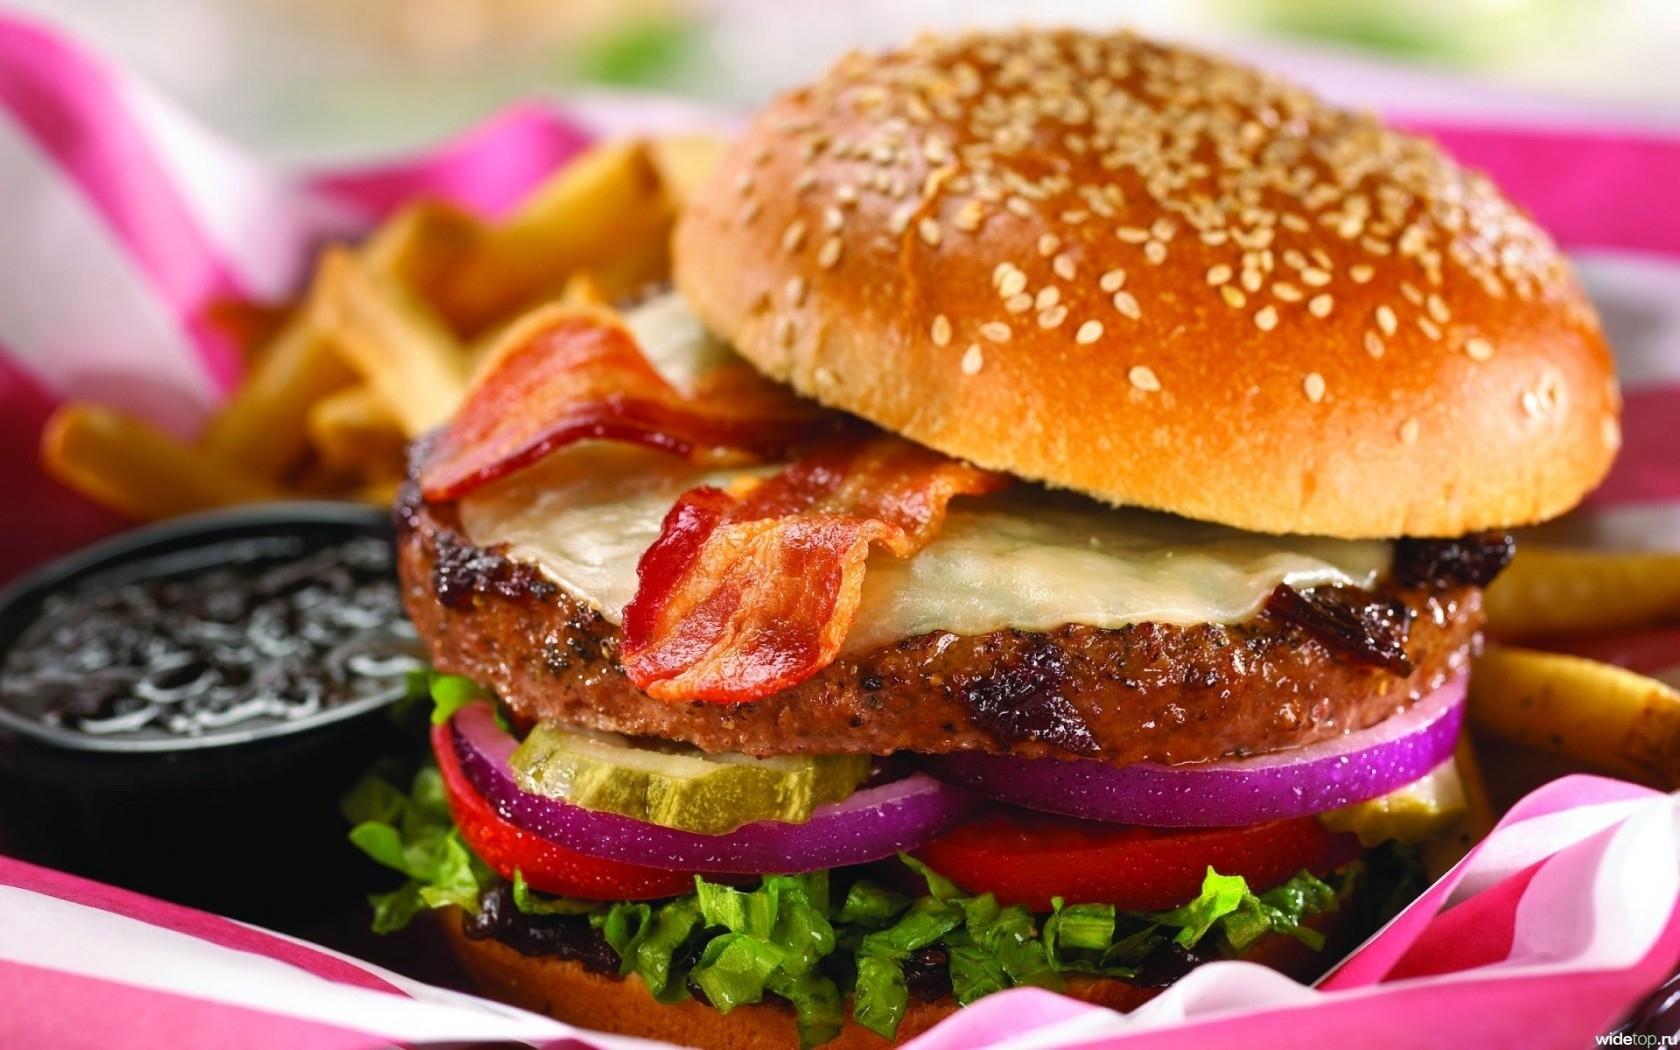 YUMMY FAST FOOD   Fast Food Photo 33414472 1680x1050